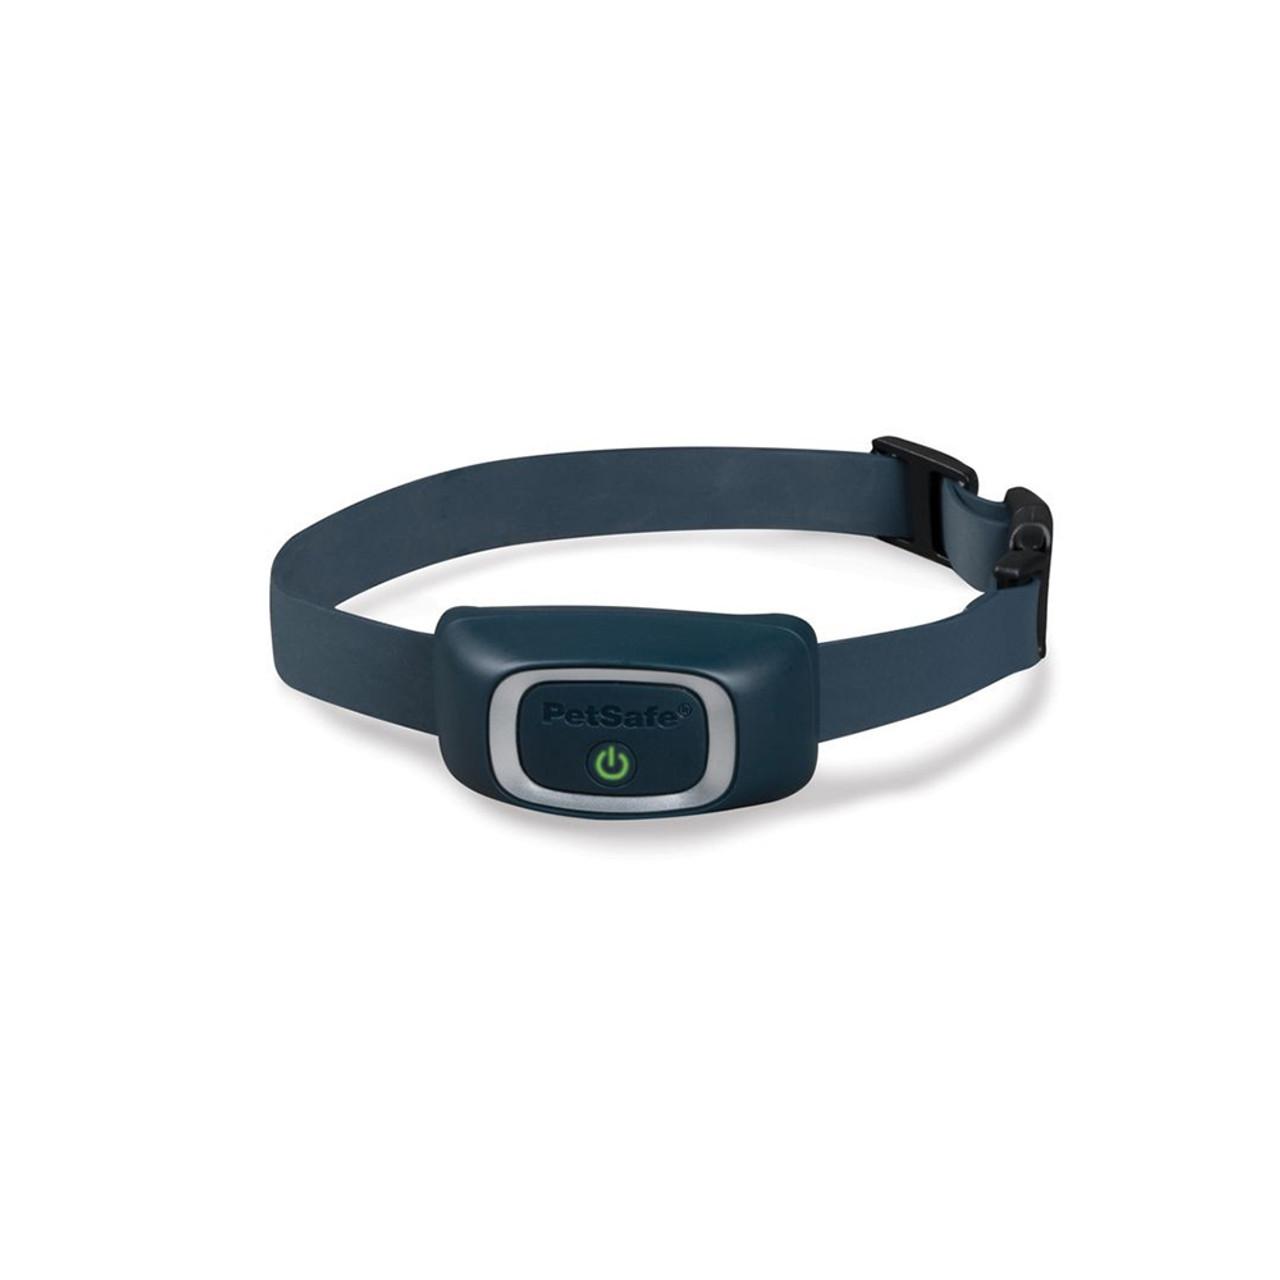 PetSafe Rechargeable Bark Control Dog Collar